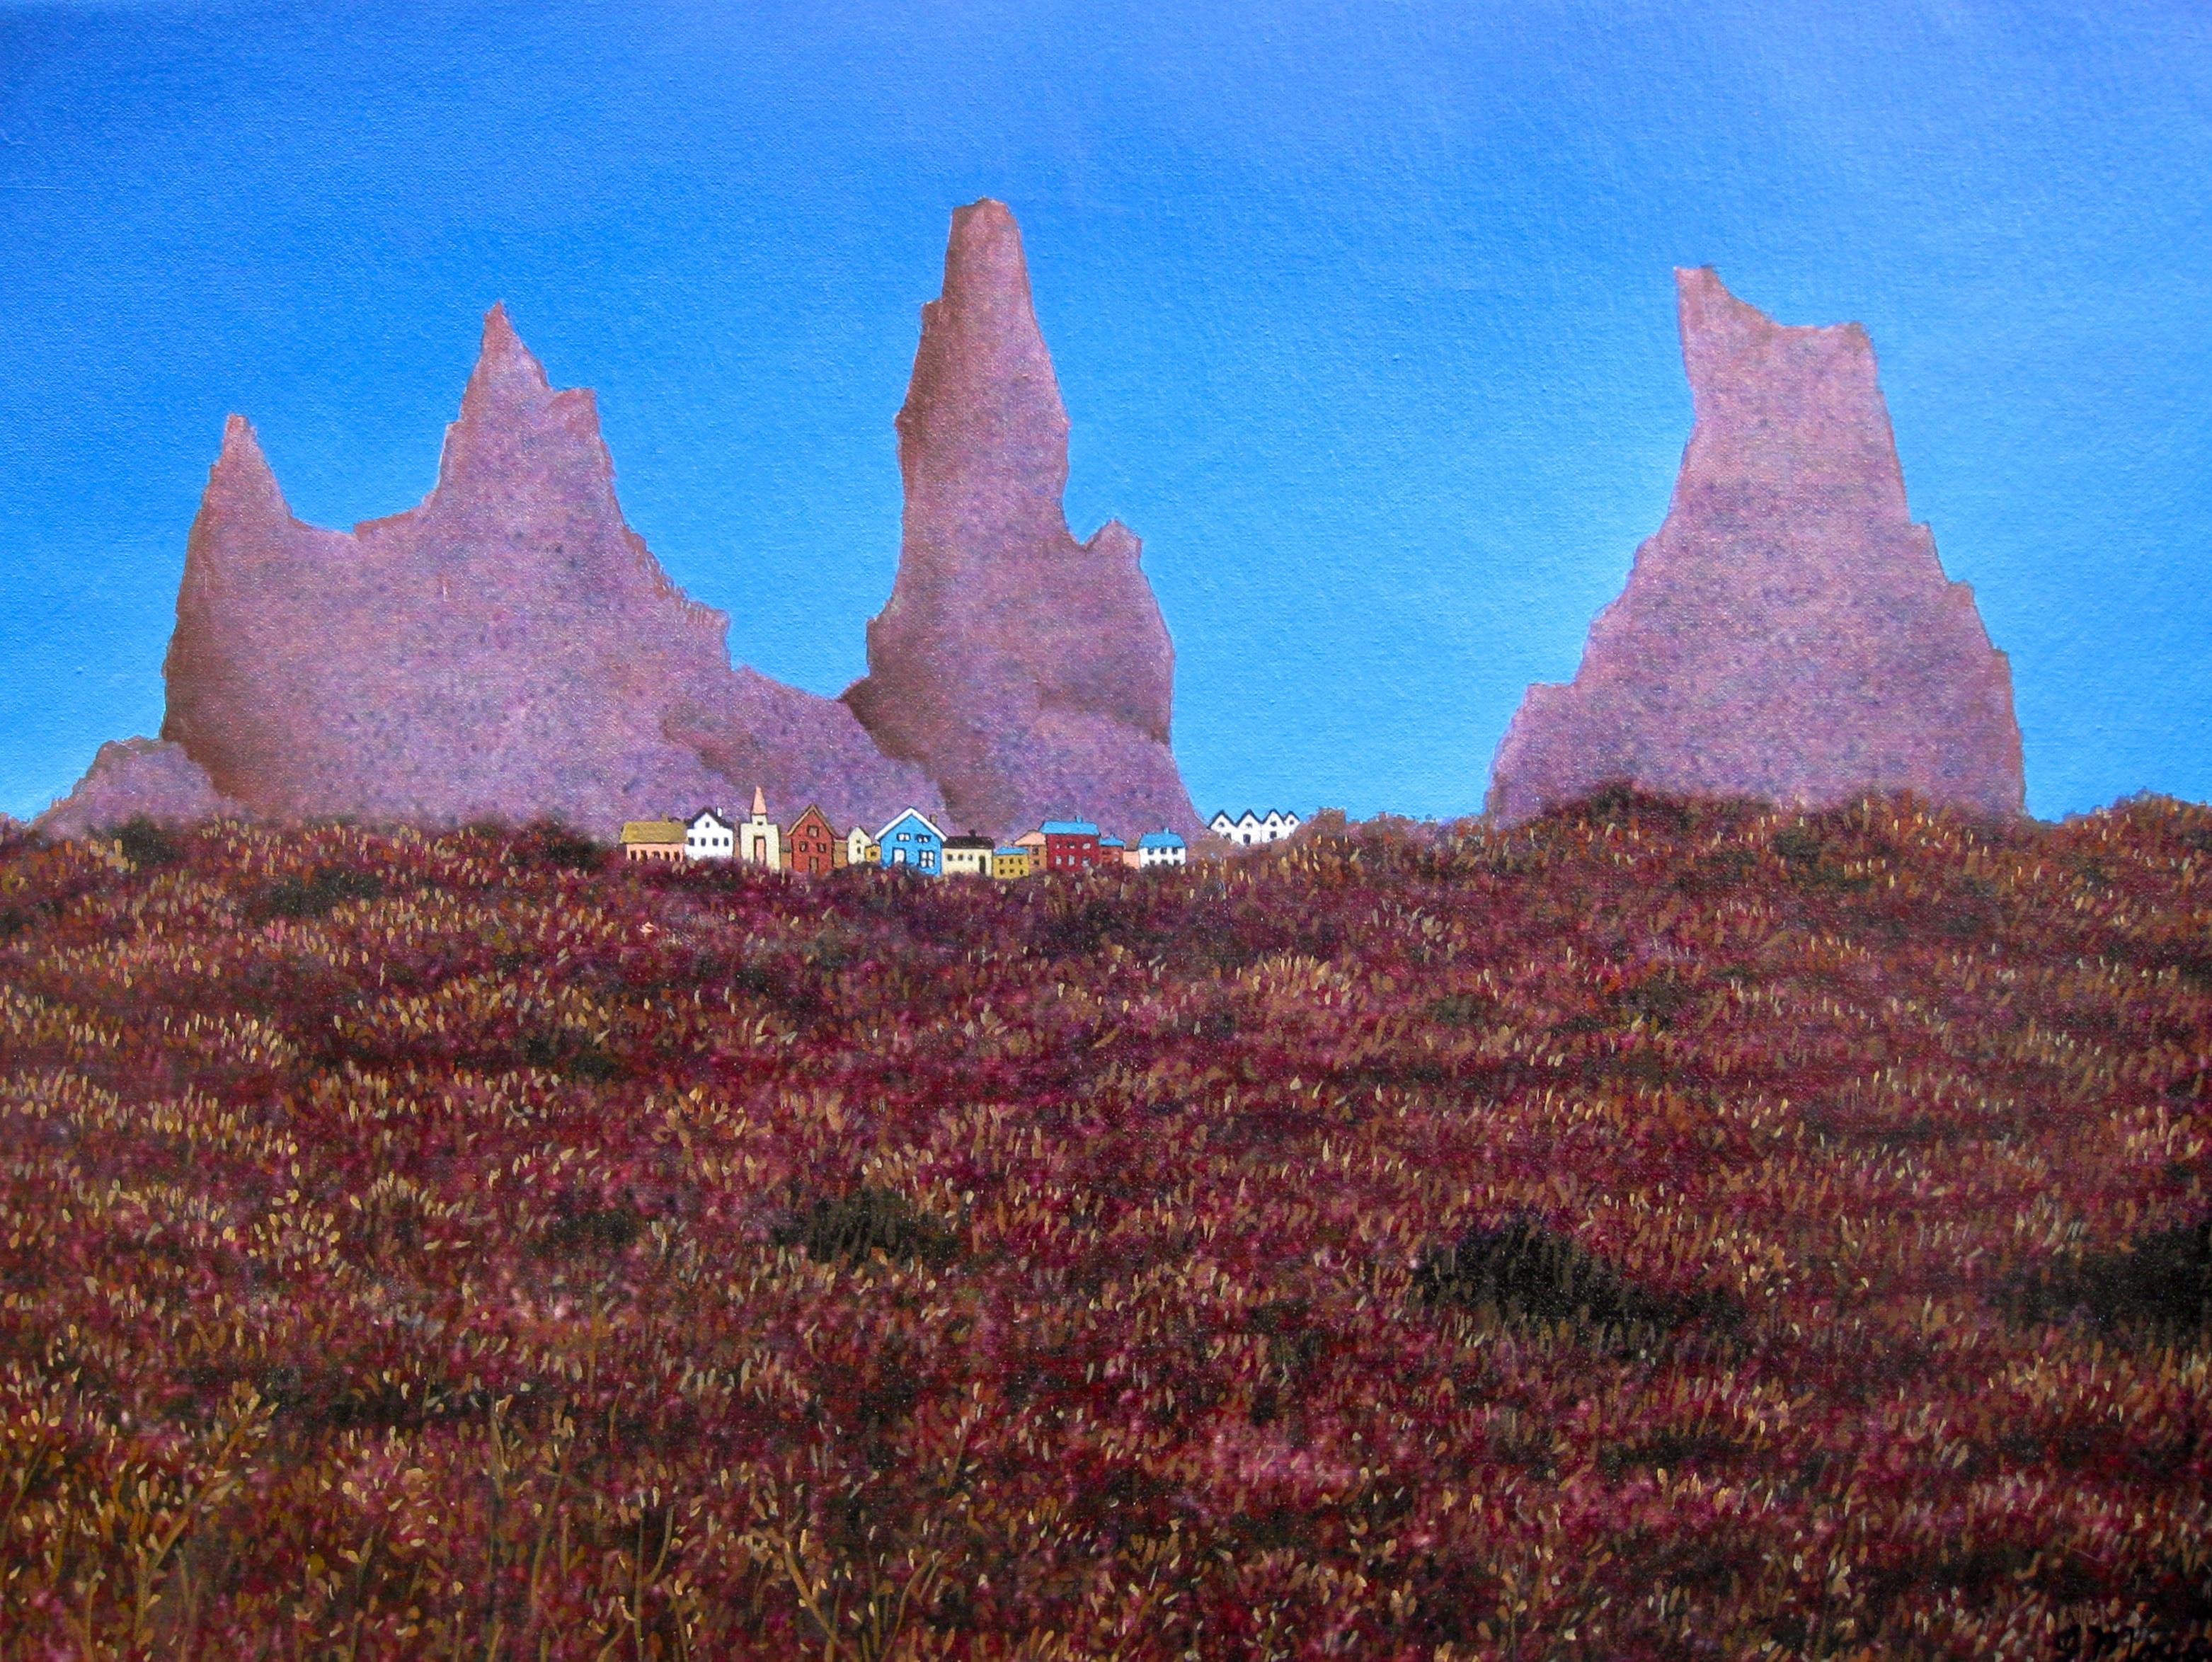 Jacqueline Moses 19 Iceland The Trolls  18__x24__